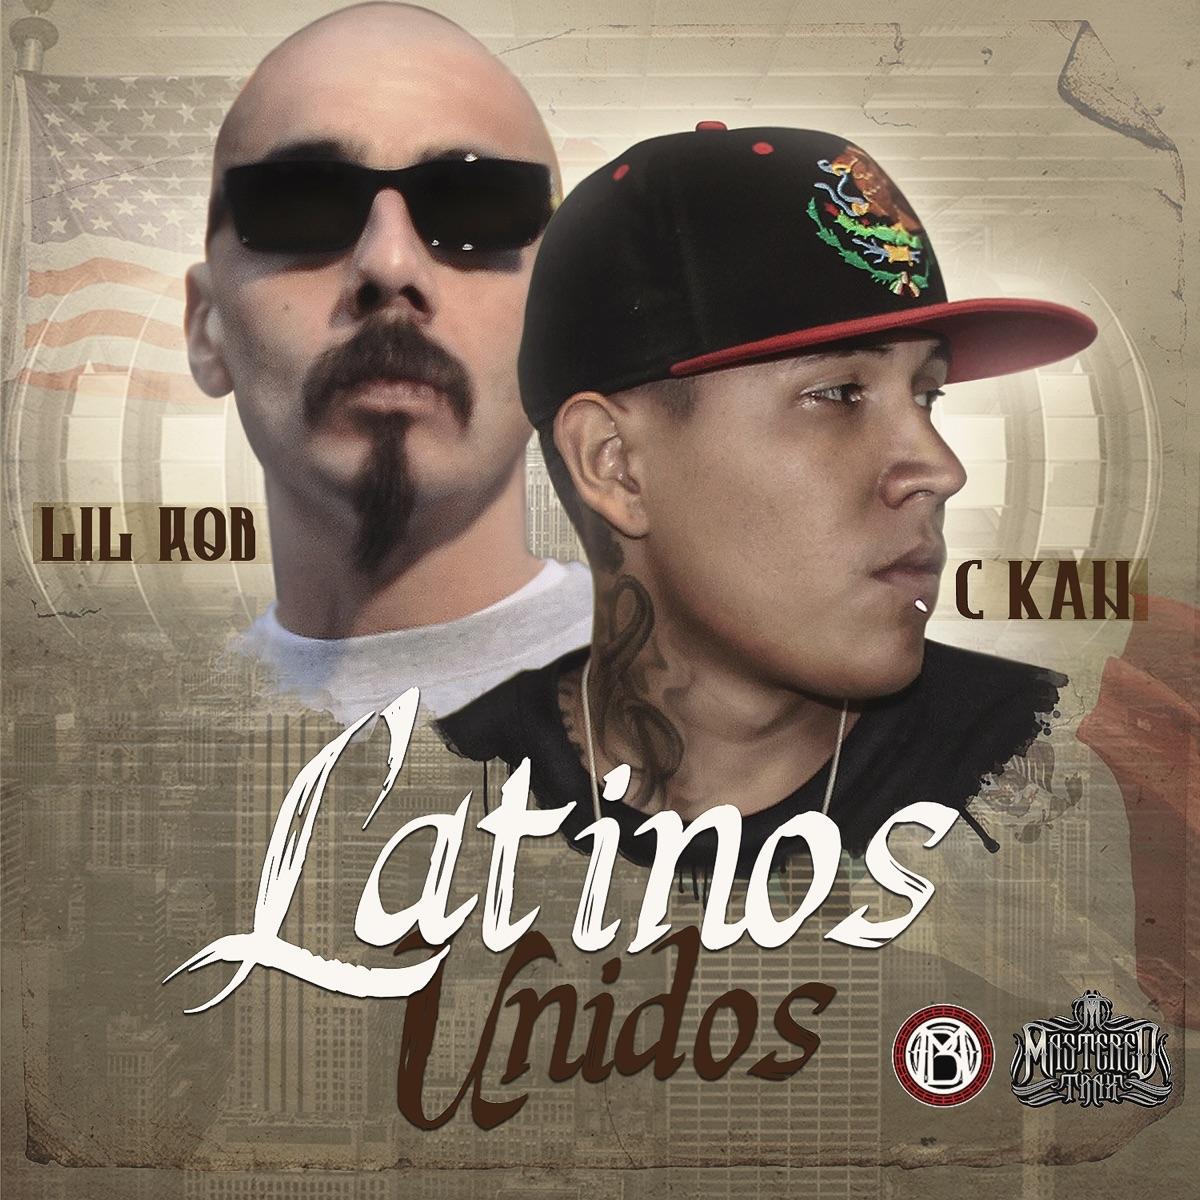 Latinos Unidos Album Cover by C-Kan